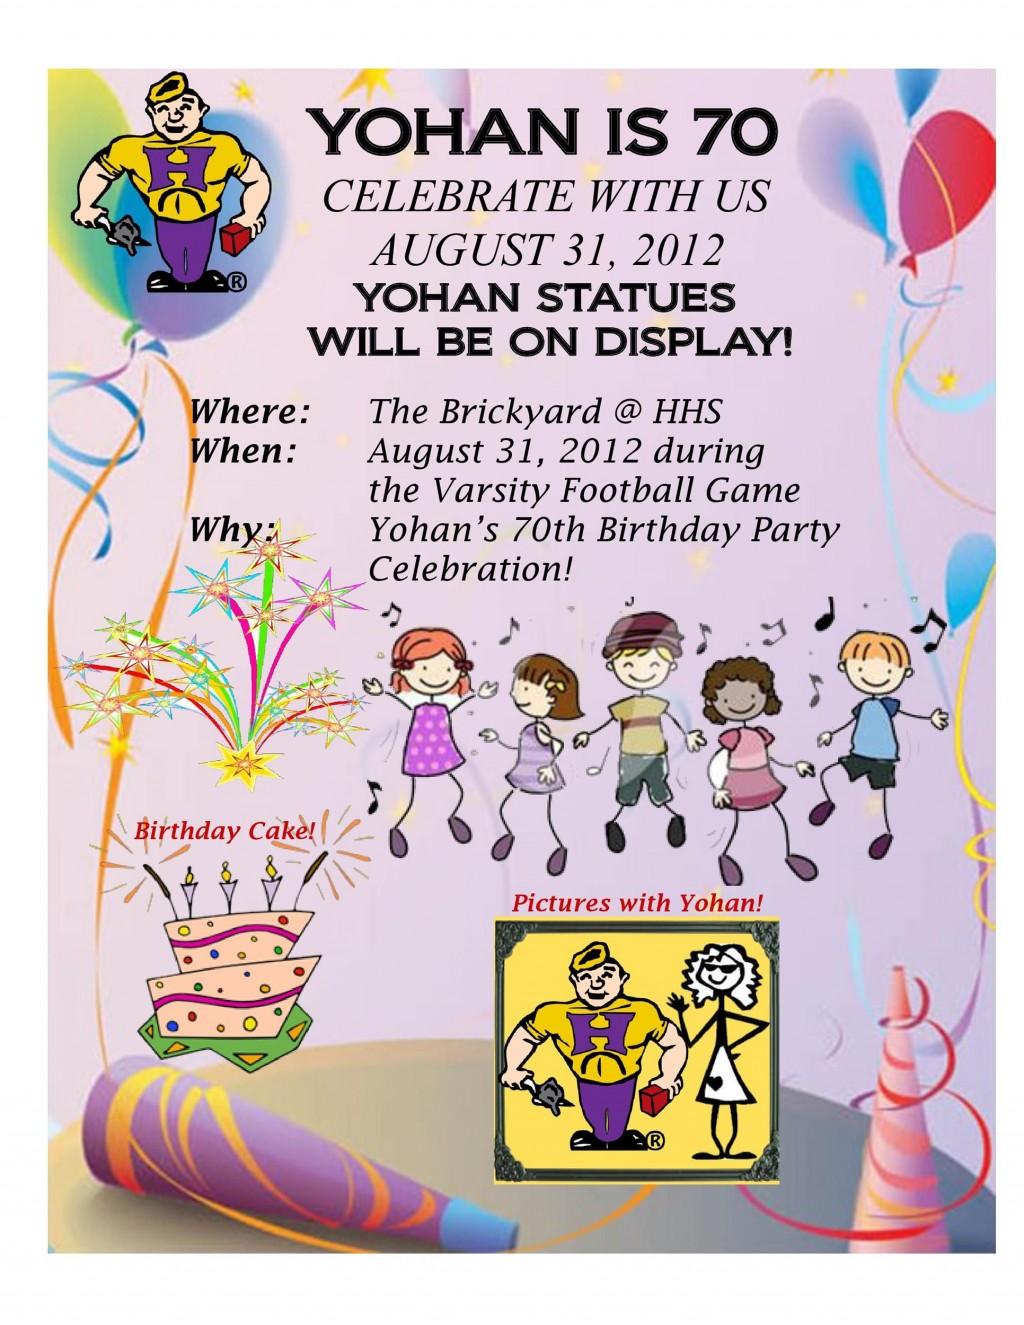 007 Unusual Free Christma Party Invitation Template Uk Inspiration Large